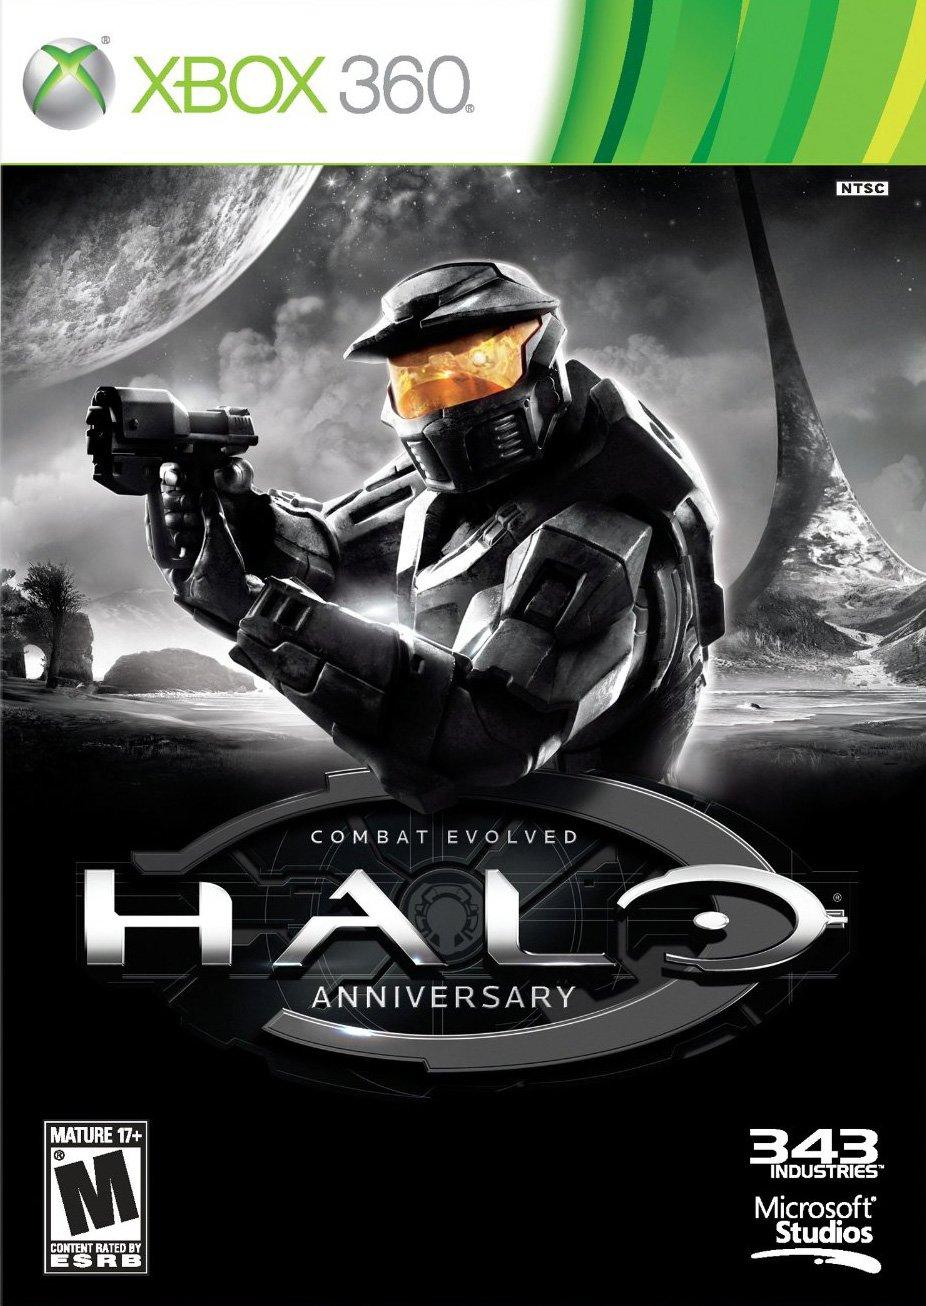 Halo: Combat Evolved Anniversary (XBOX 360) Review 2